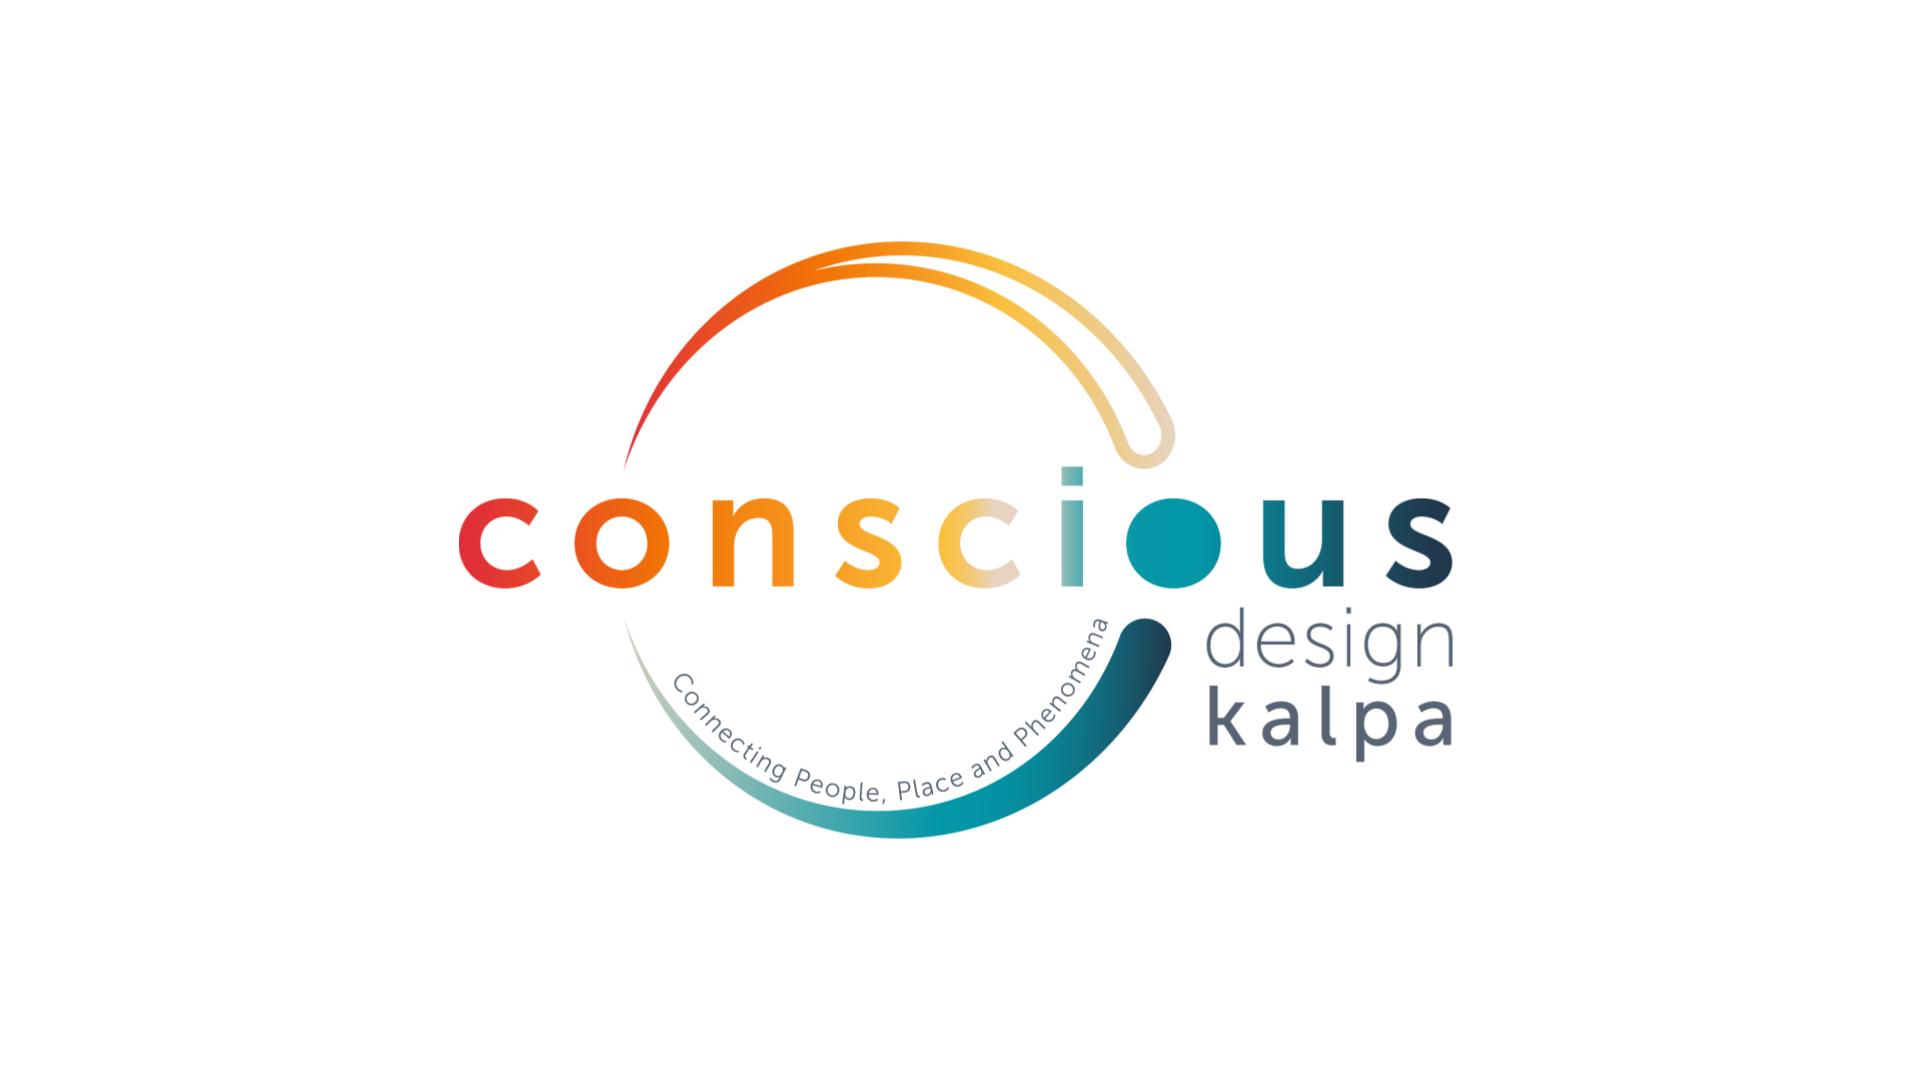 Conscious Design Kalpa Organisation logo